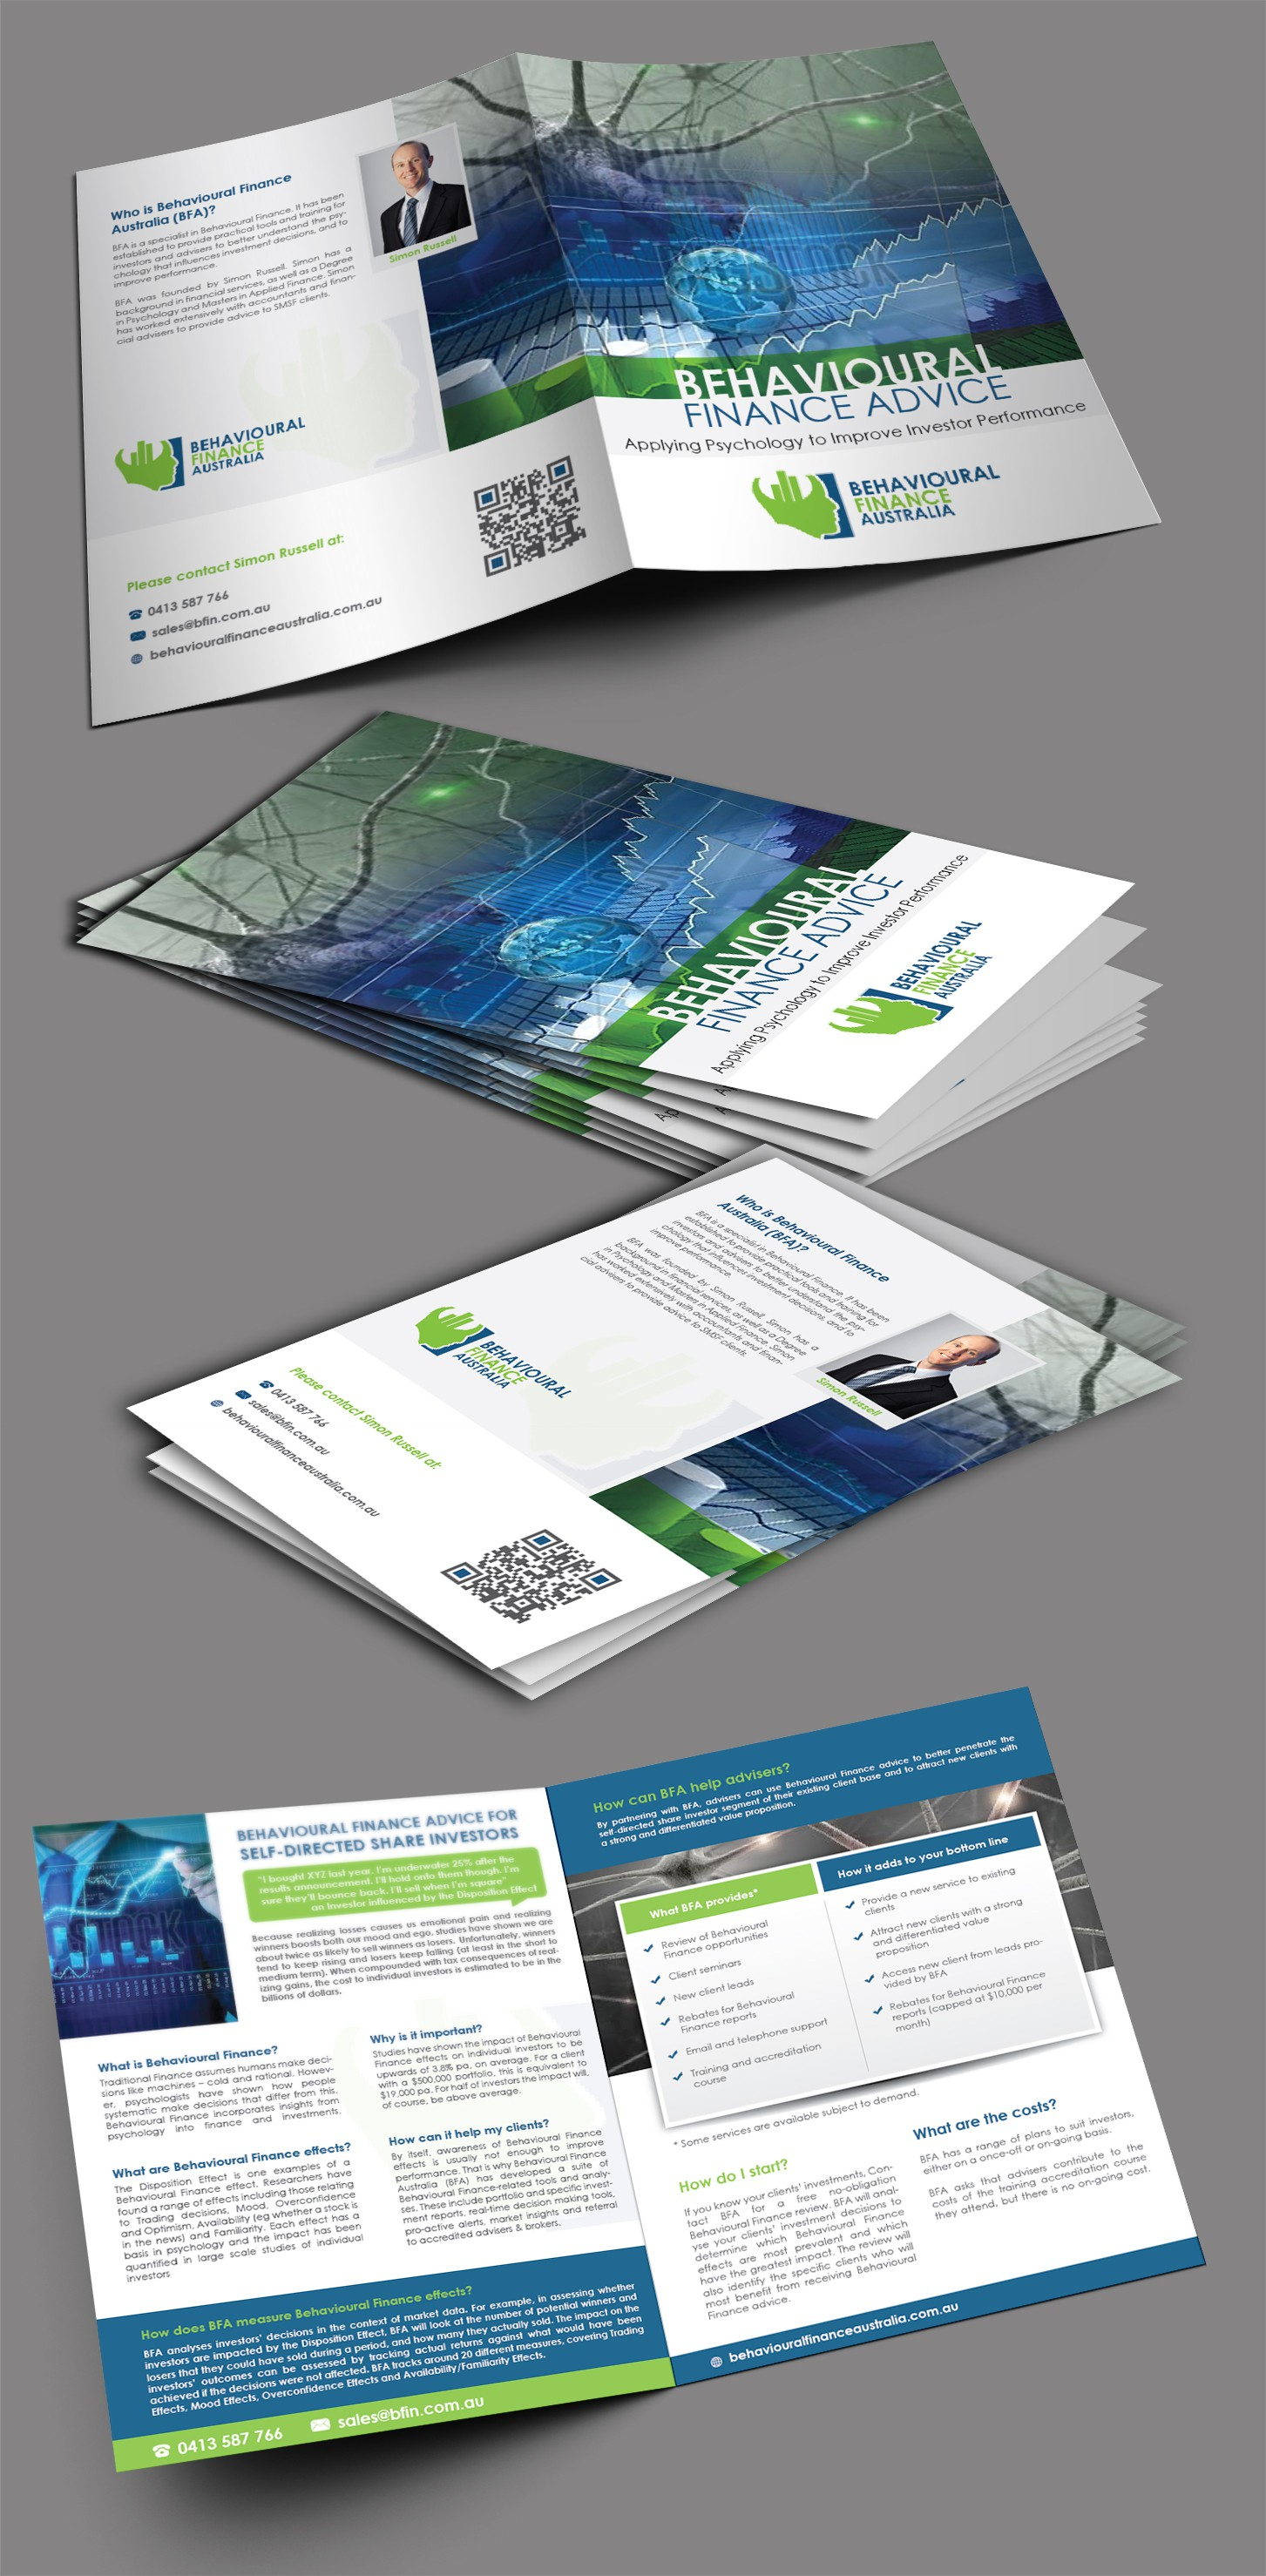 Behavioural Finance Brochure for Financial Advisers